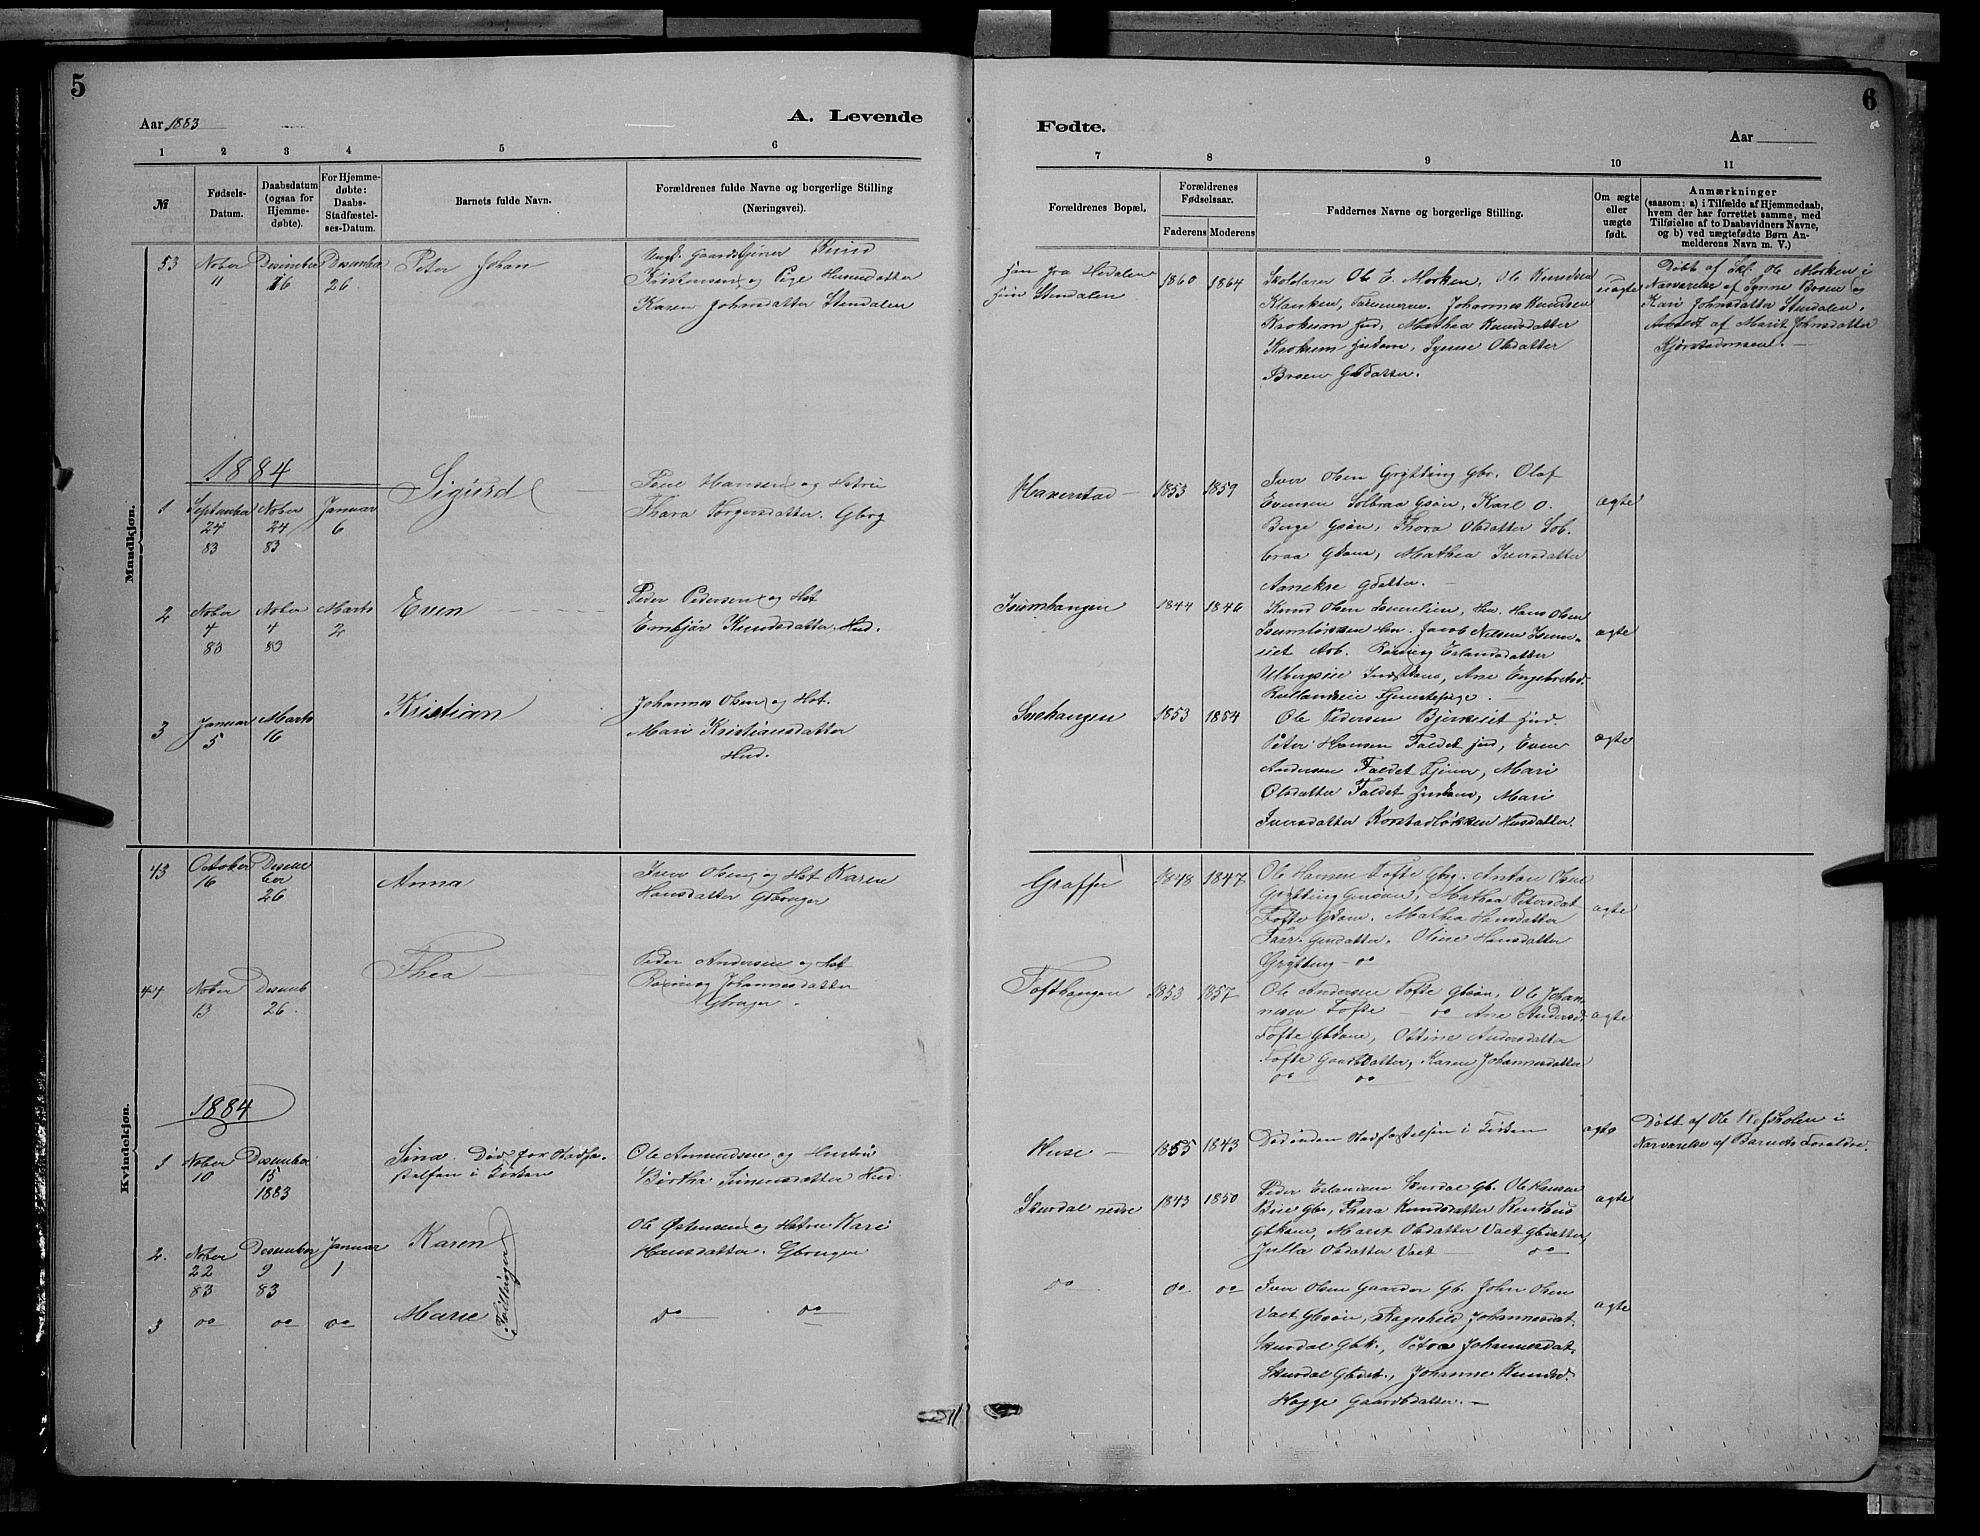 SAH, Sør-Fron prestekontor, H/Ha/Hab/L0003: Klokkerbok nr. 3, 1884-1896, s. 5-6